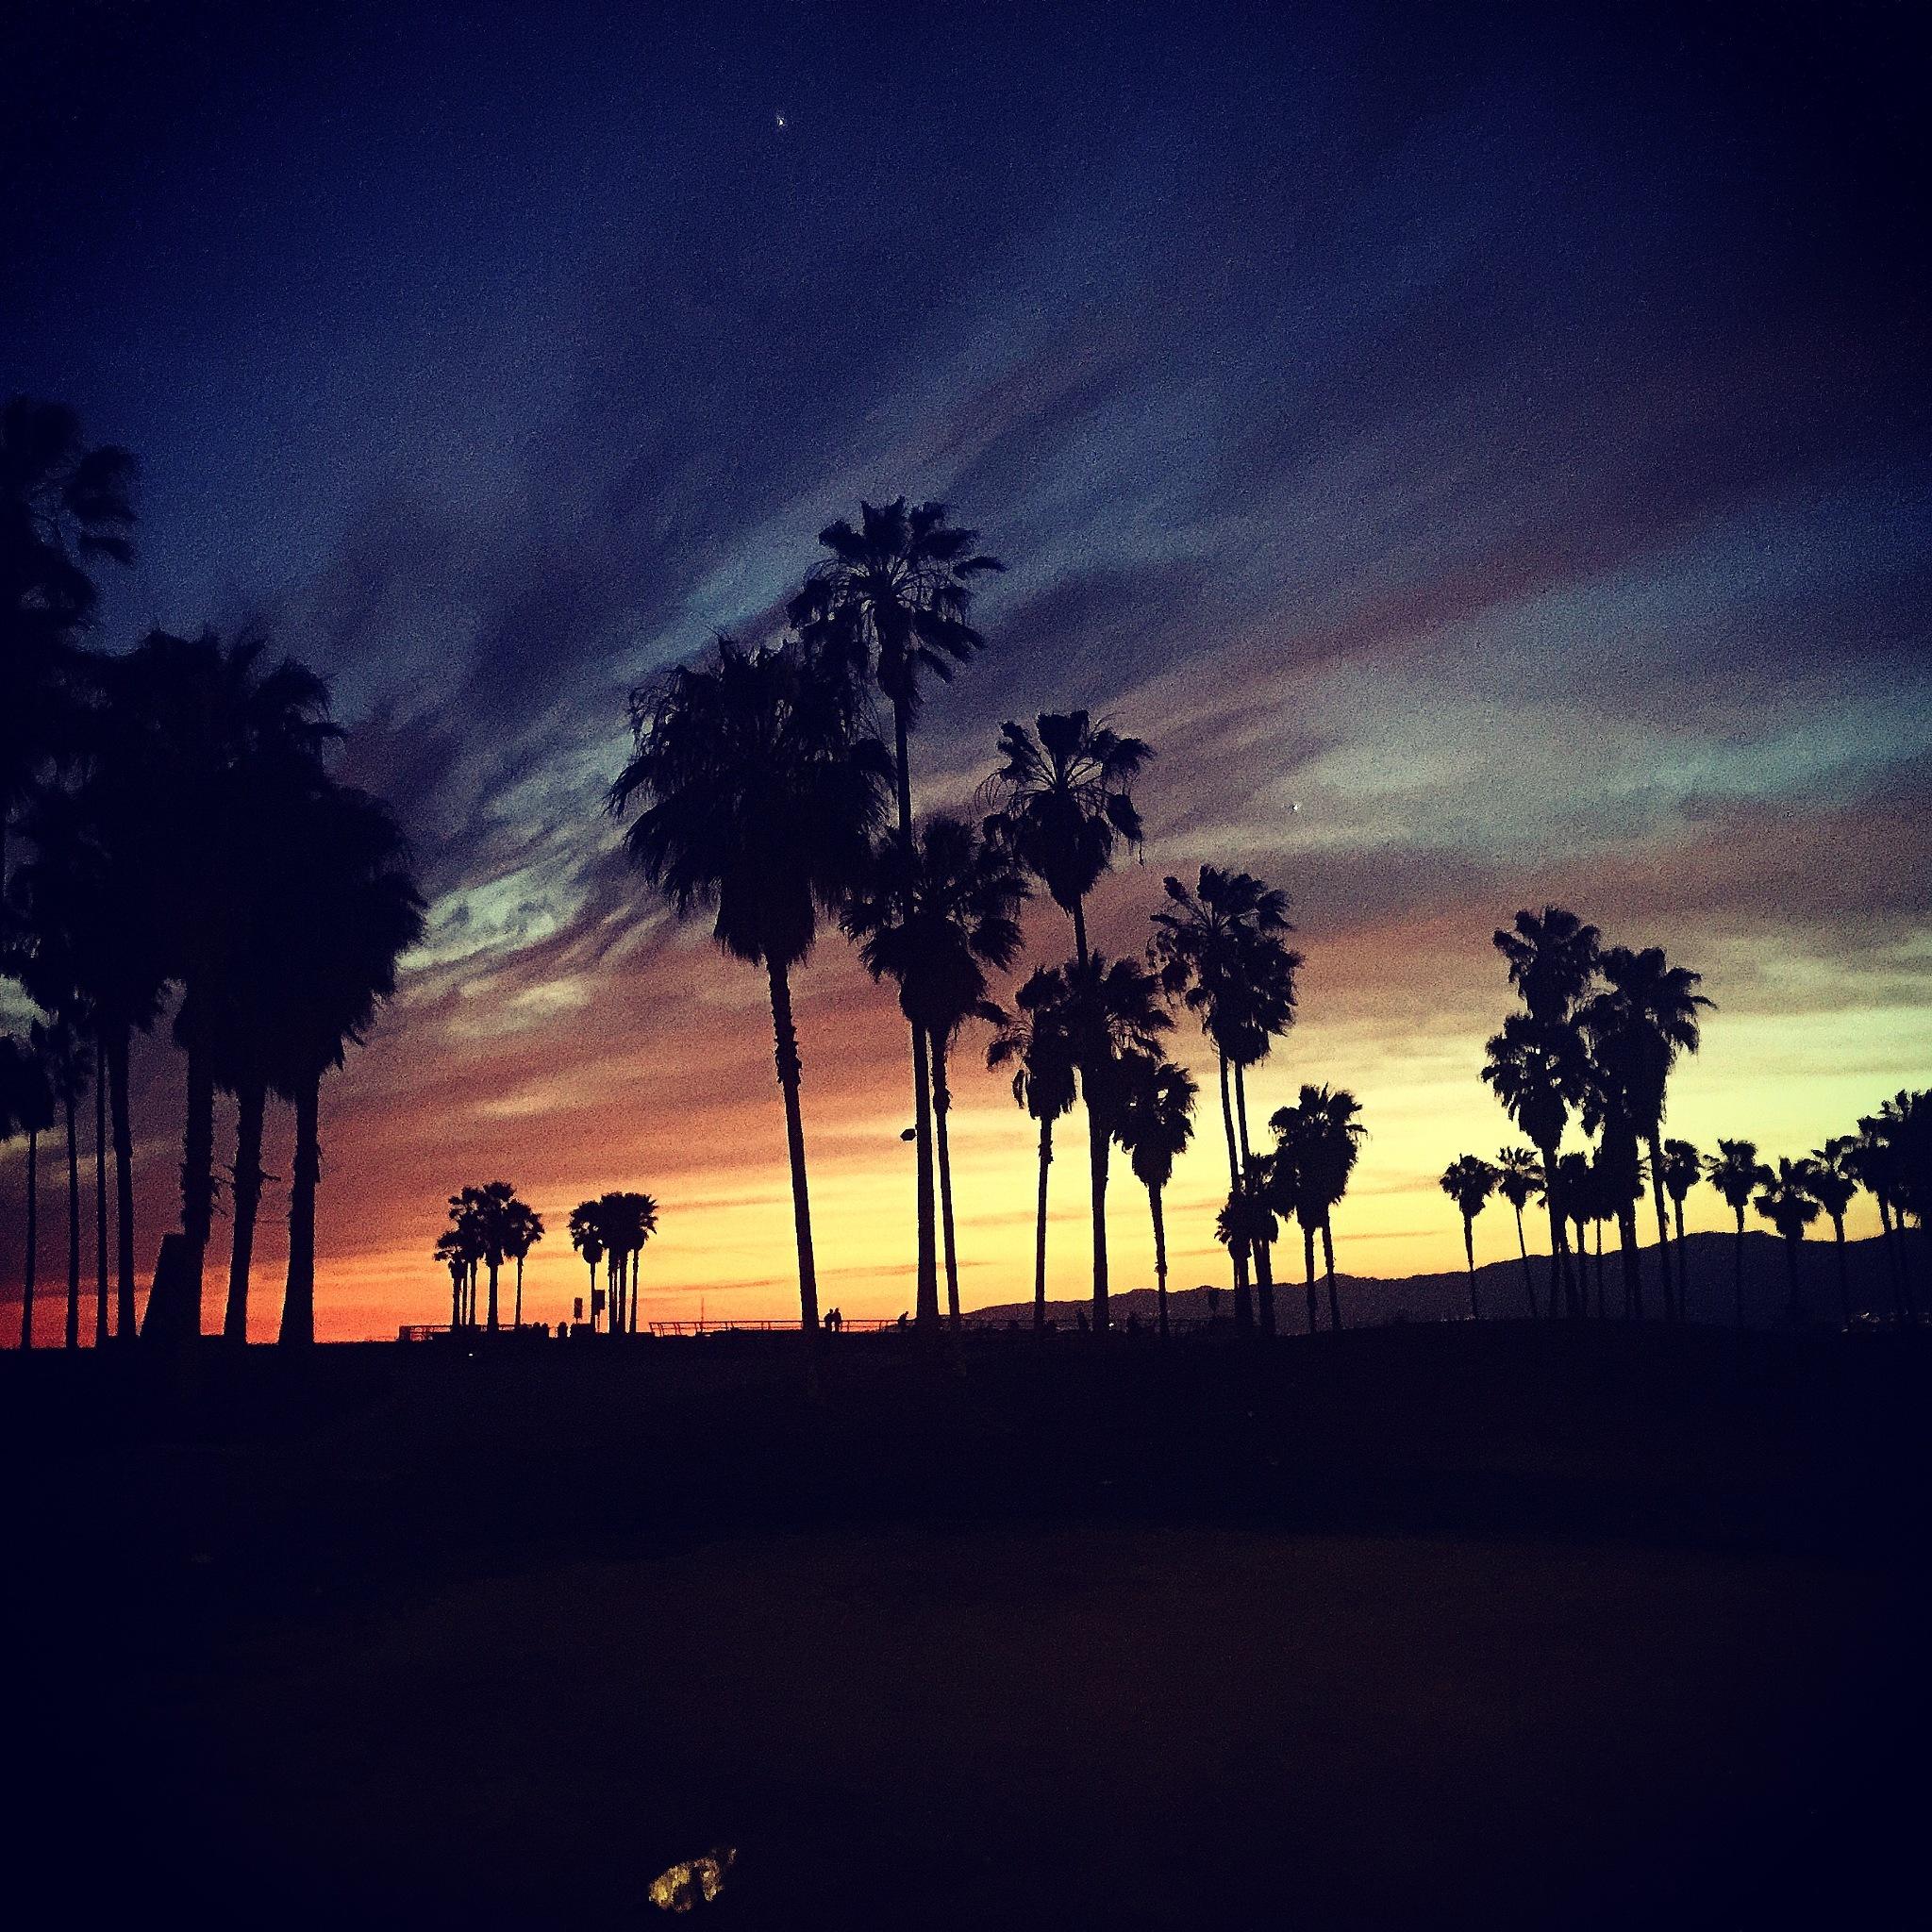 California Dreamin by JasonHawksworth